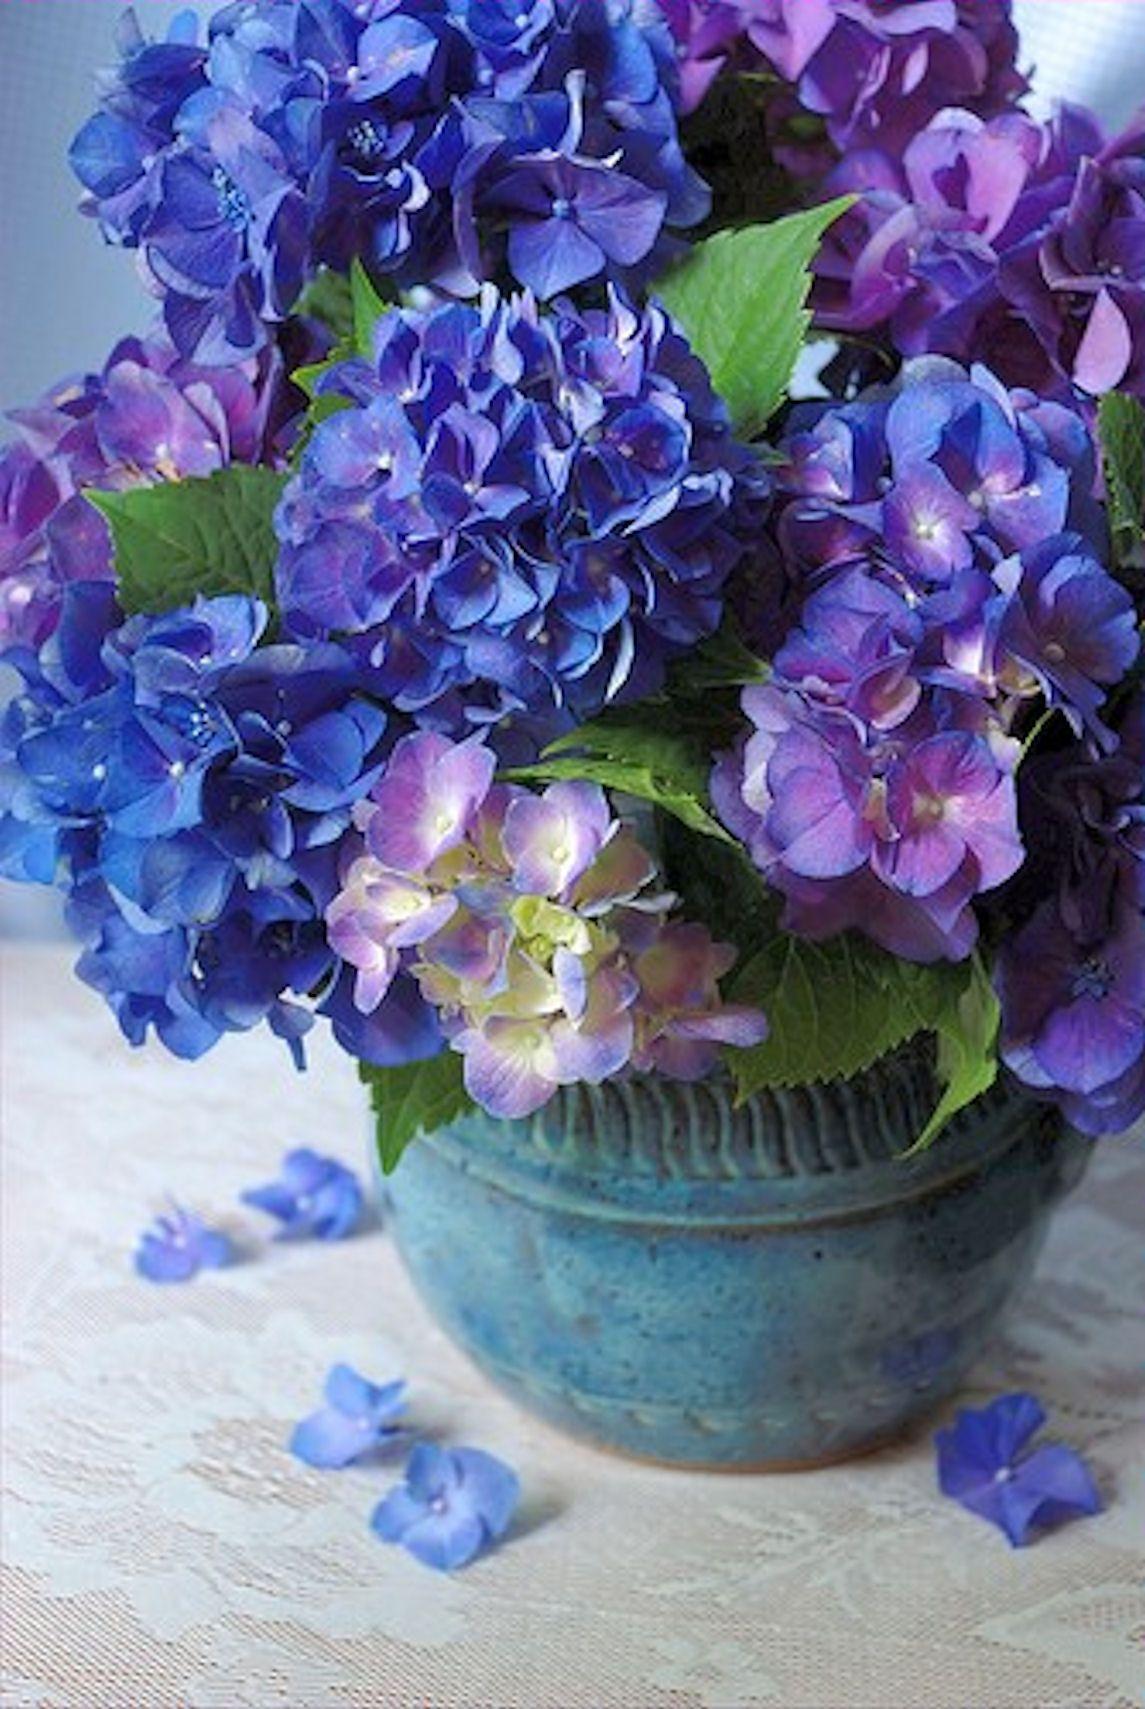 Pin By Cupcakemom On Flowers Beautiful Flowers Pretty Flowers Flower Arrangements